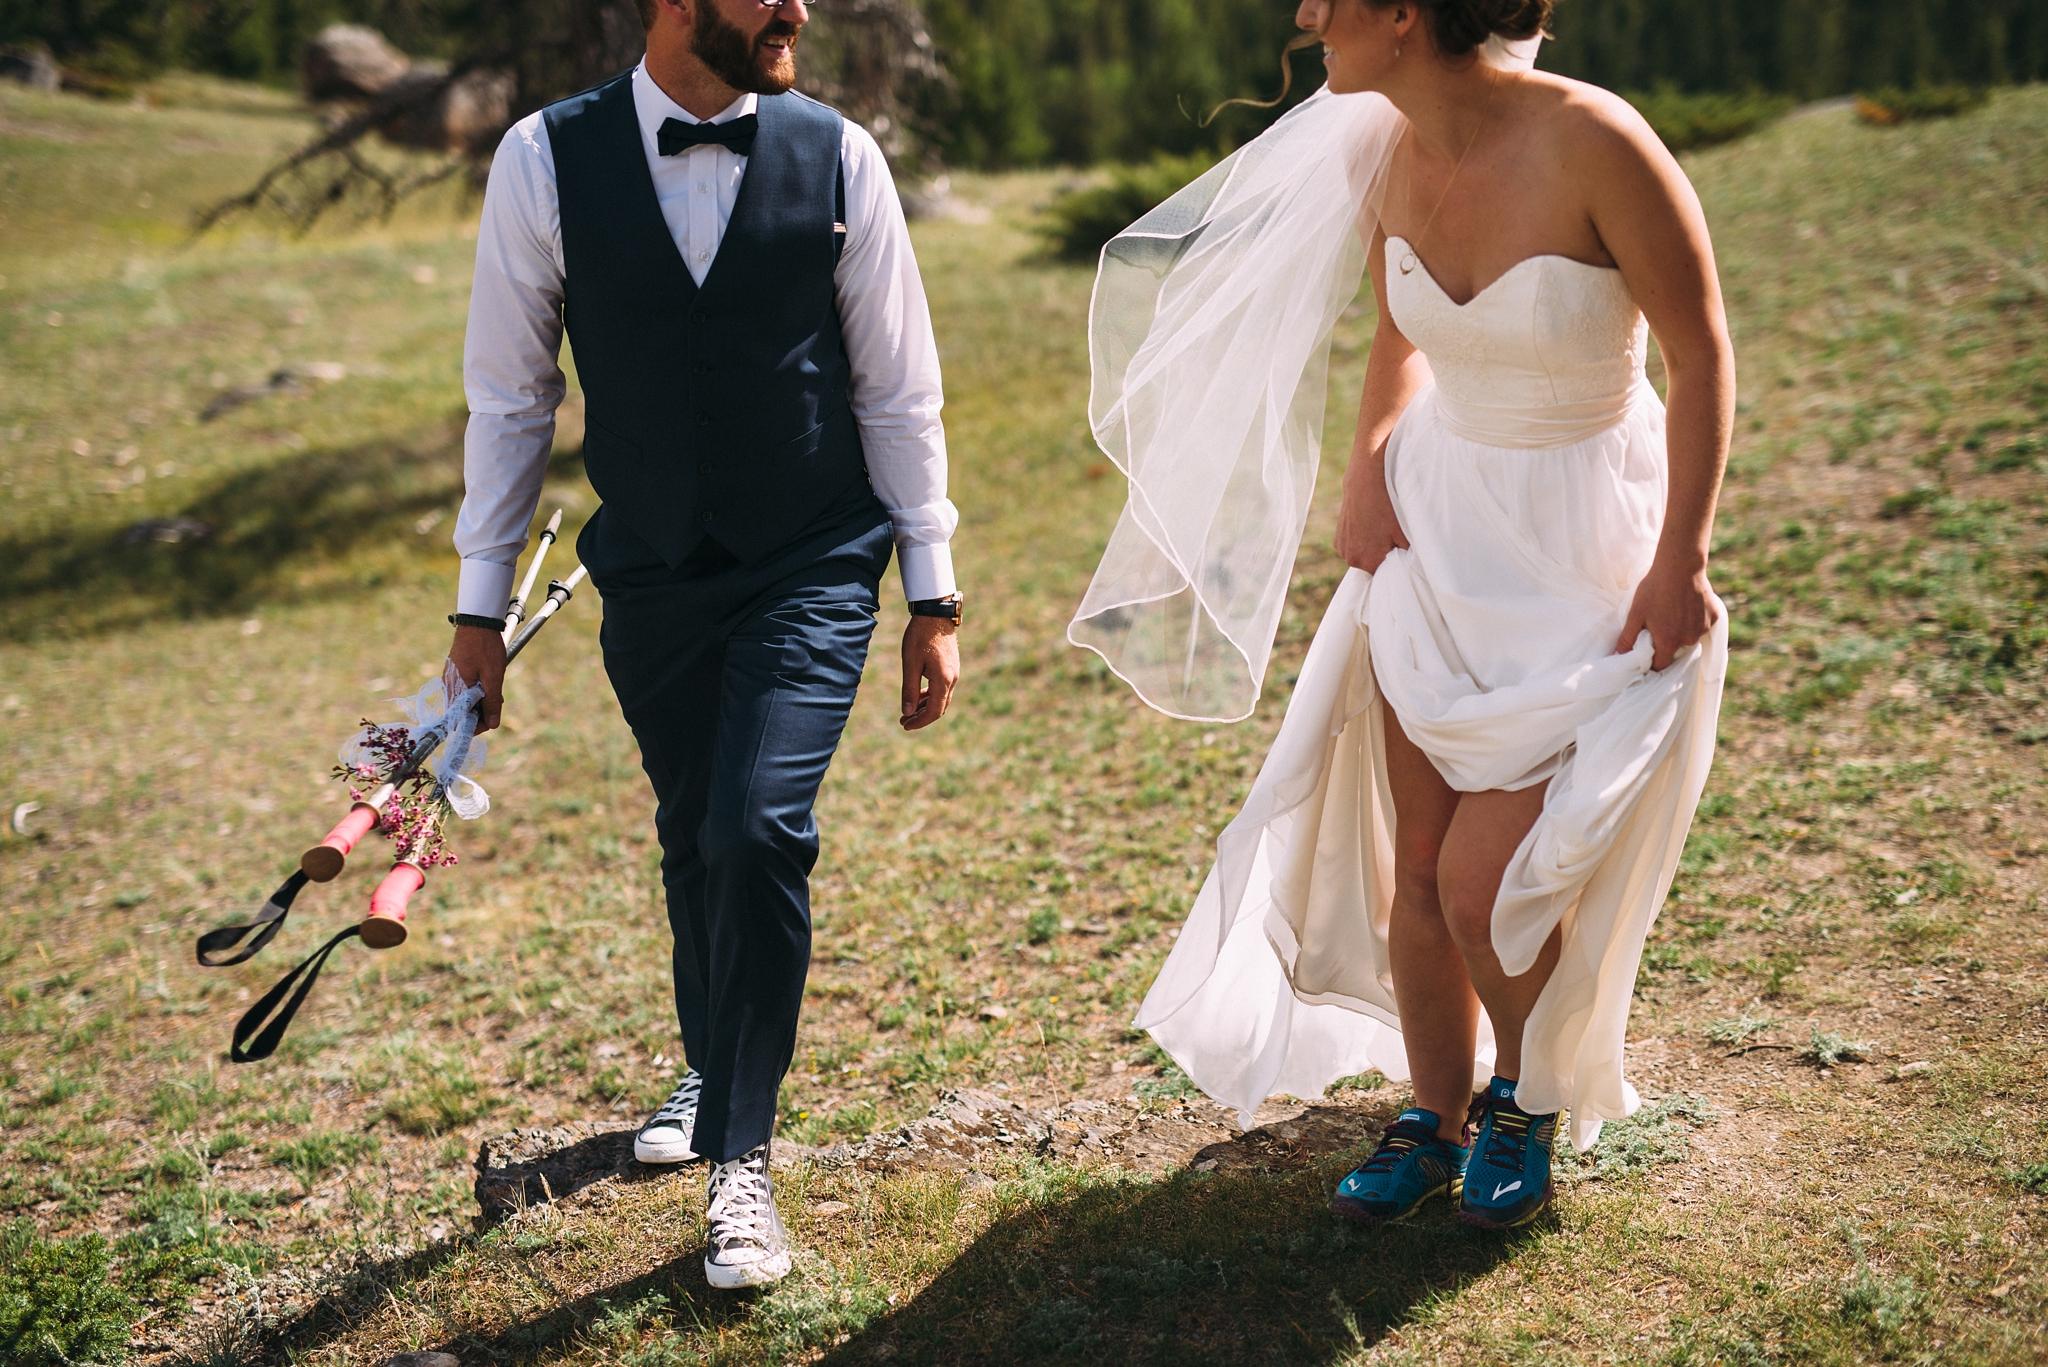 kaihla_tonai_intimate_wedding_elopement_photographer_2492